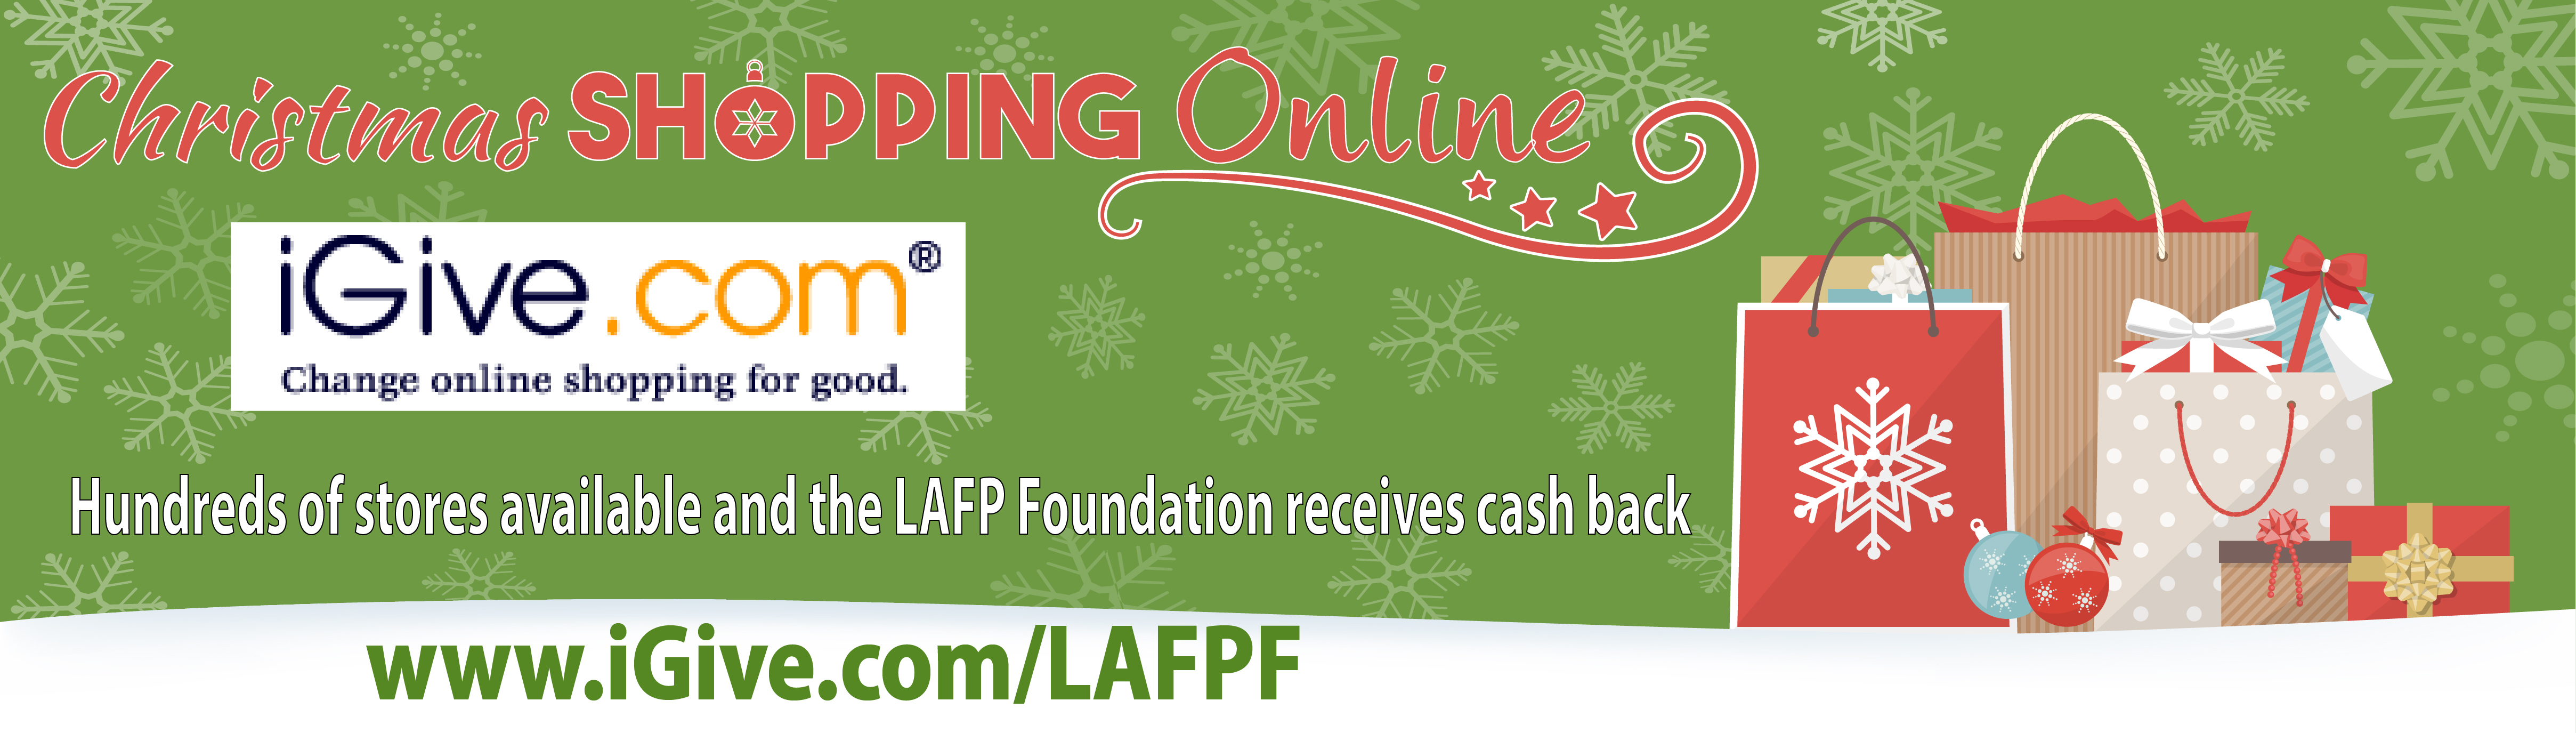 Holiday-Shop-Online-Web-Banner